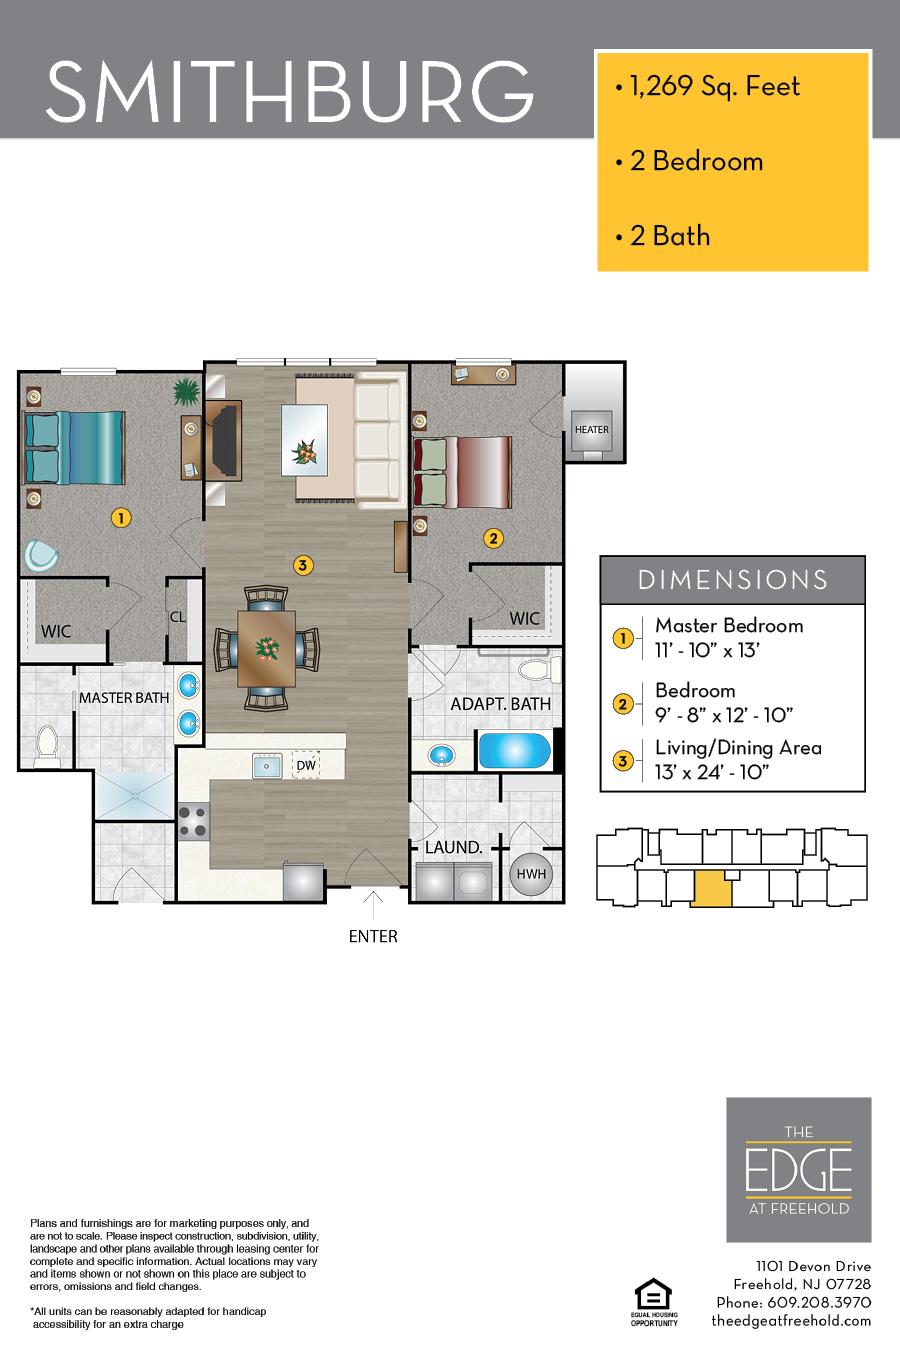 Smithburg Floor Plan